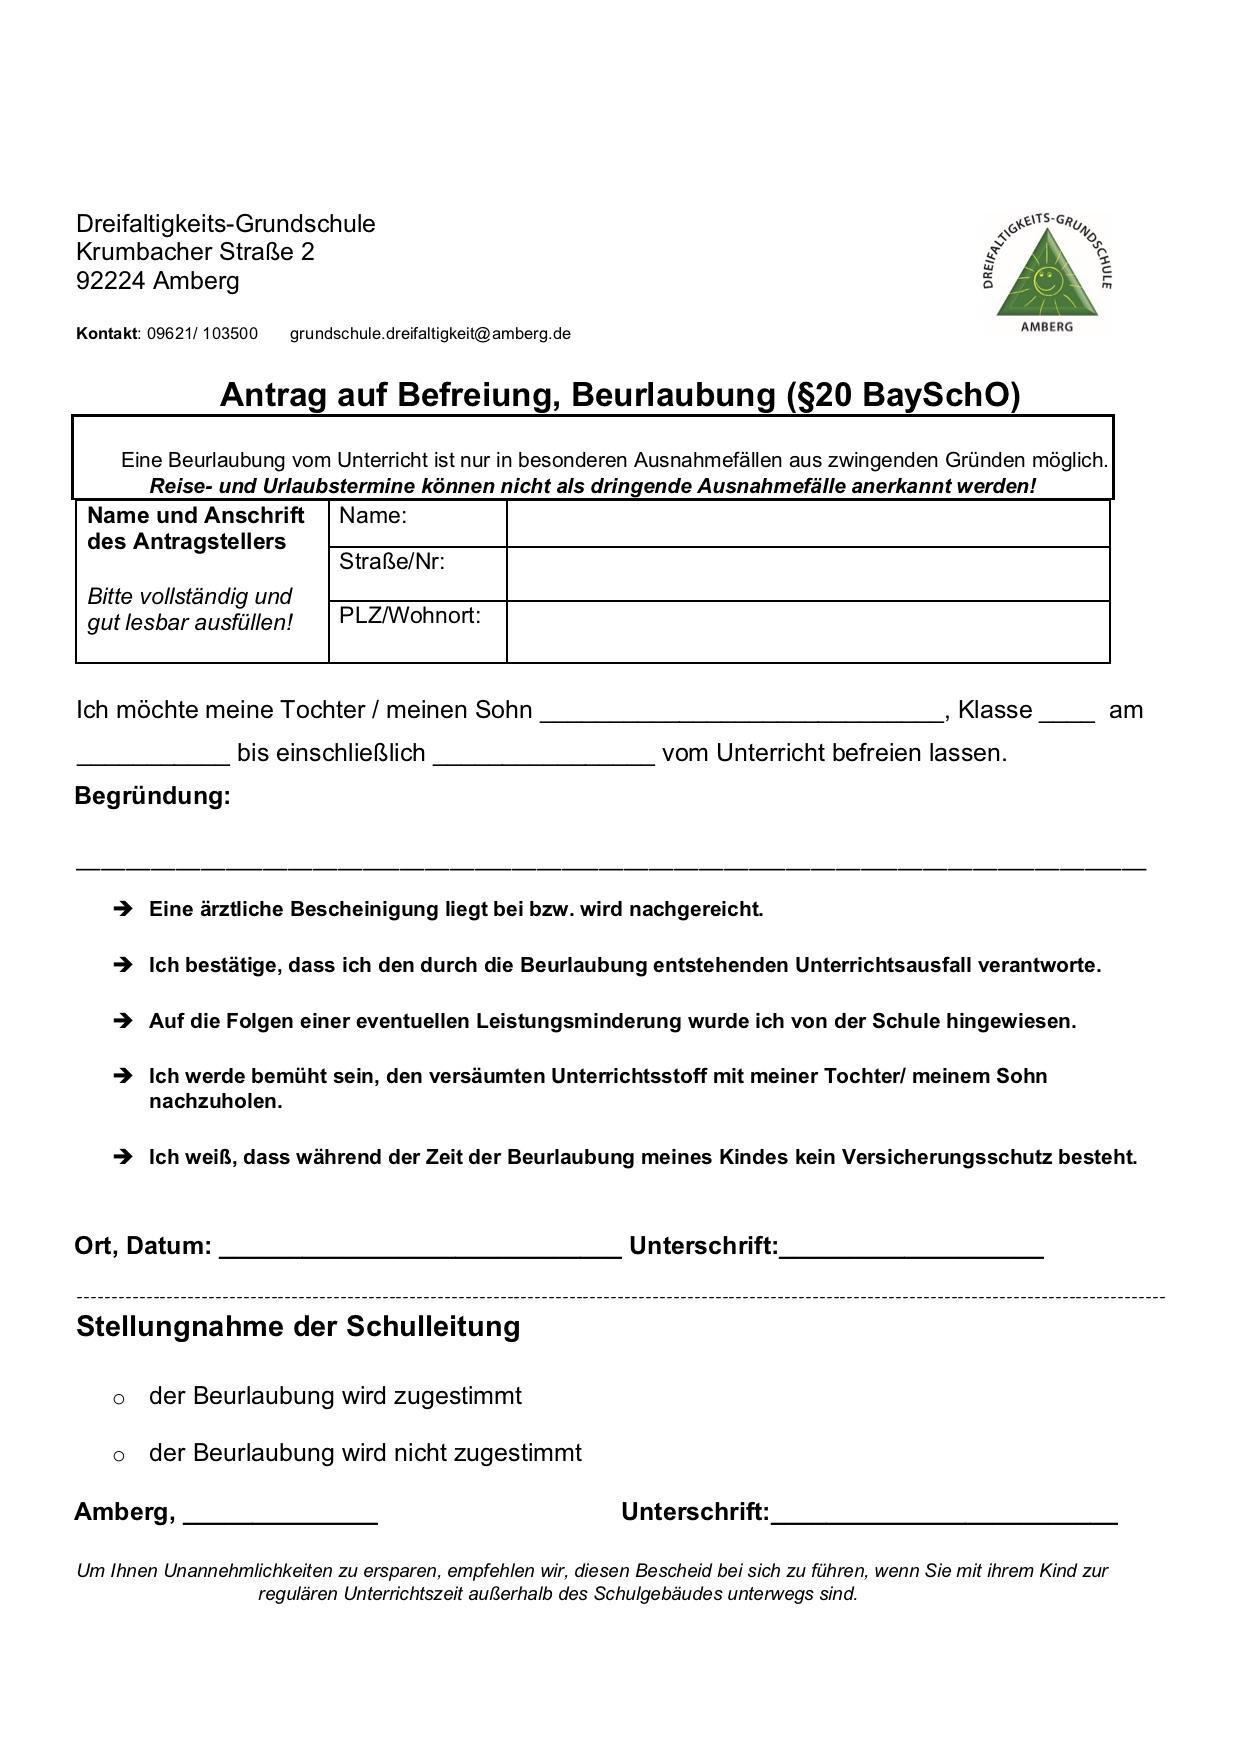 Antrag auf beurlaubung schule